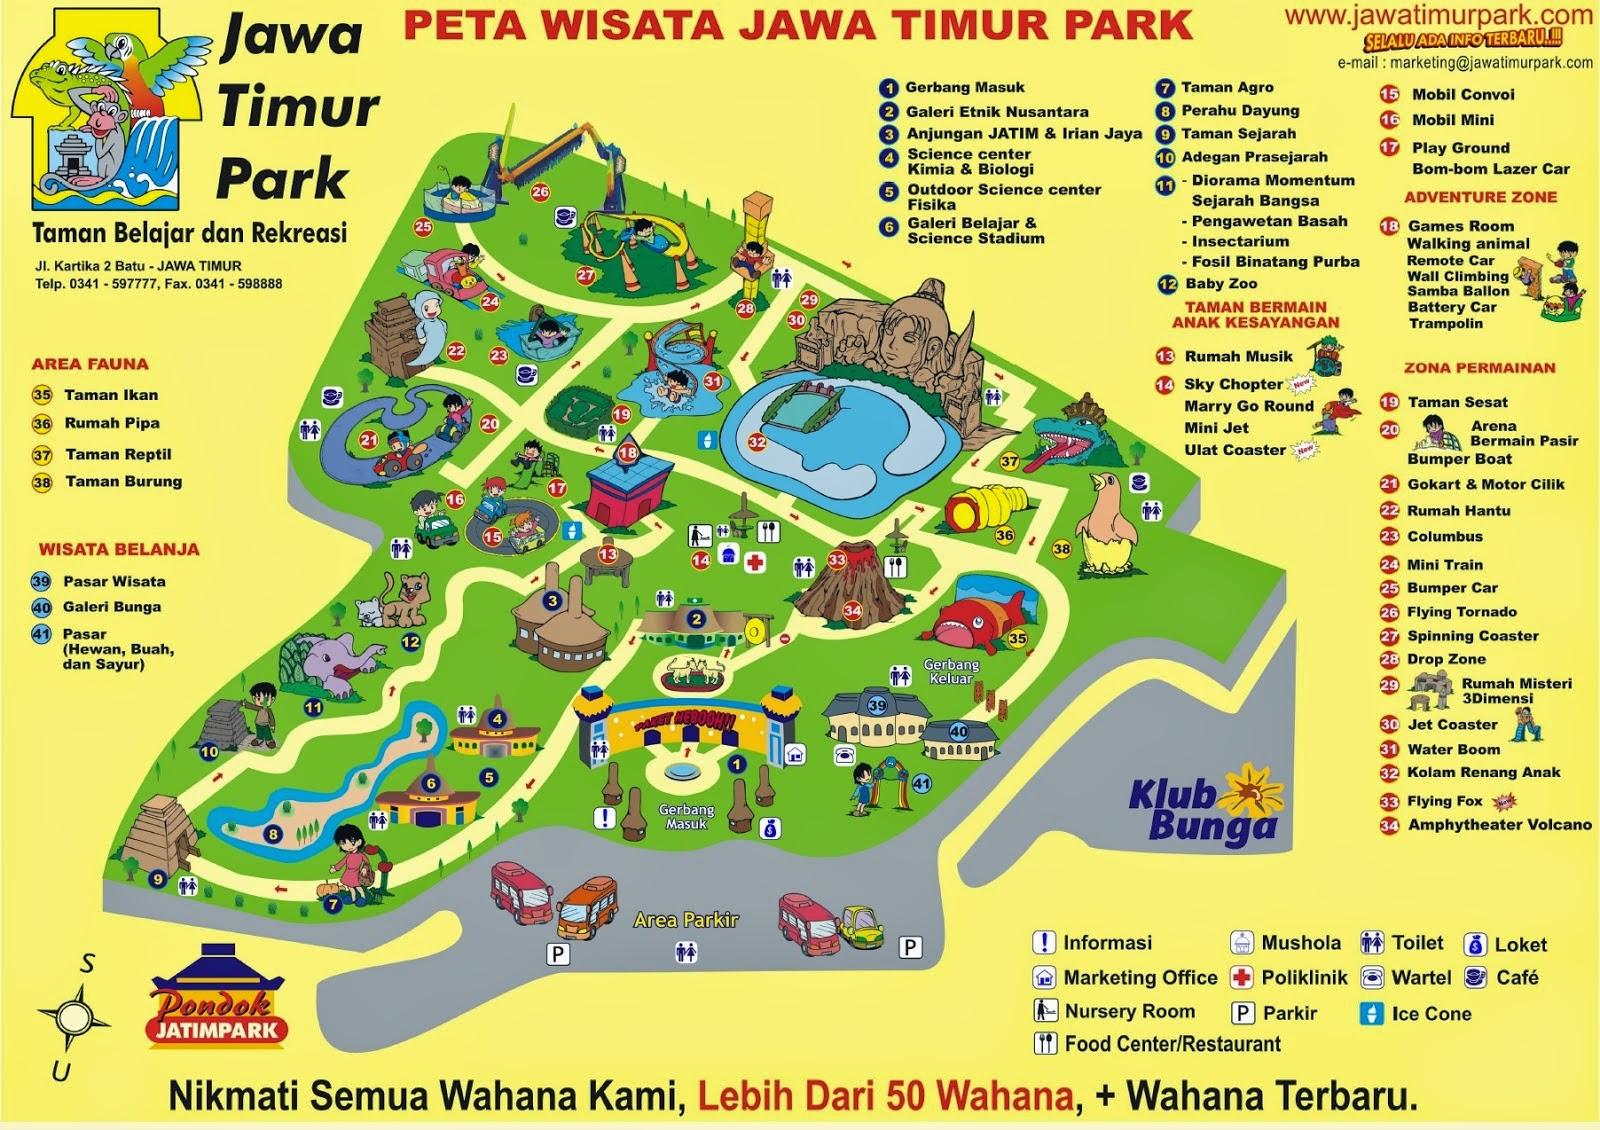 Sumber Narimo Transportasi: Wisata ke Jatim Park 1 atau ...